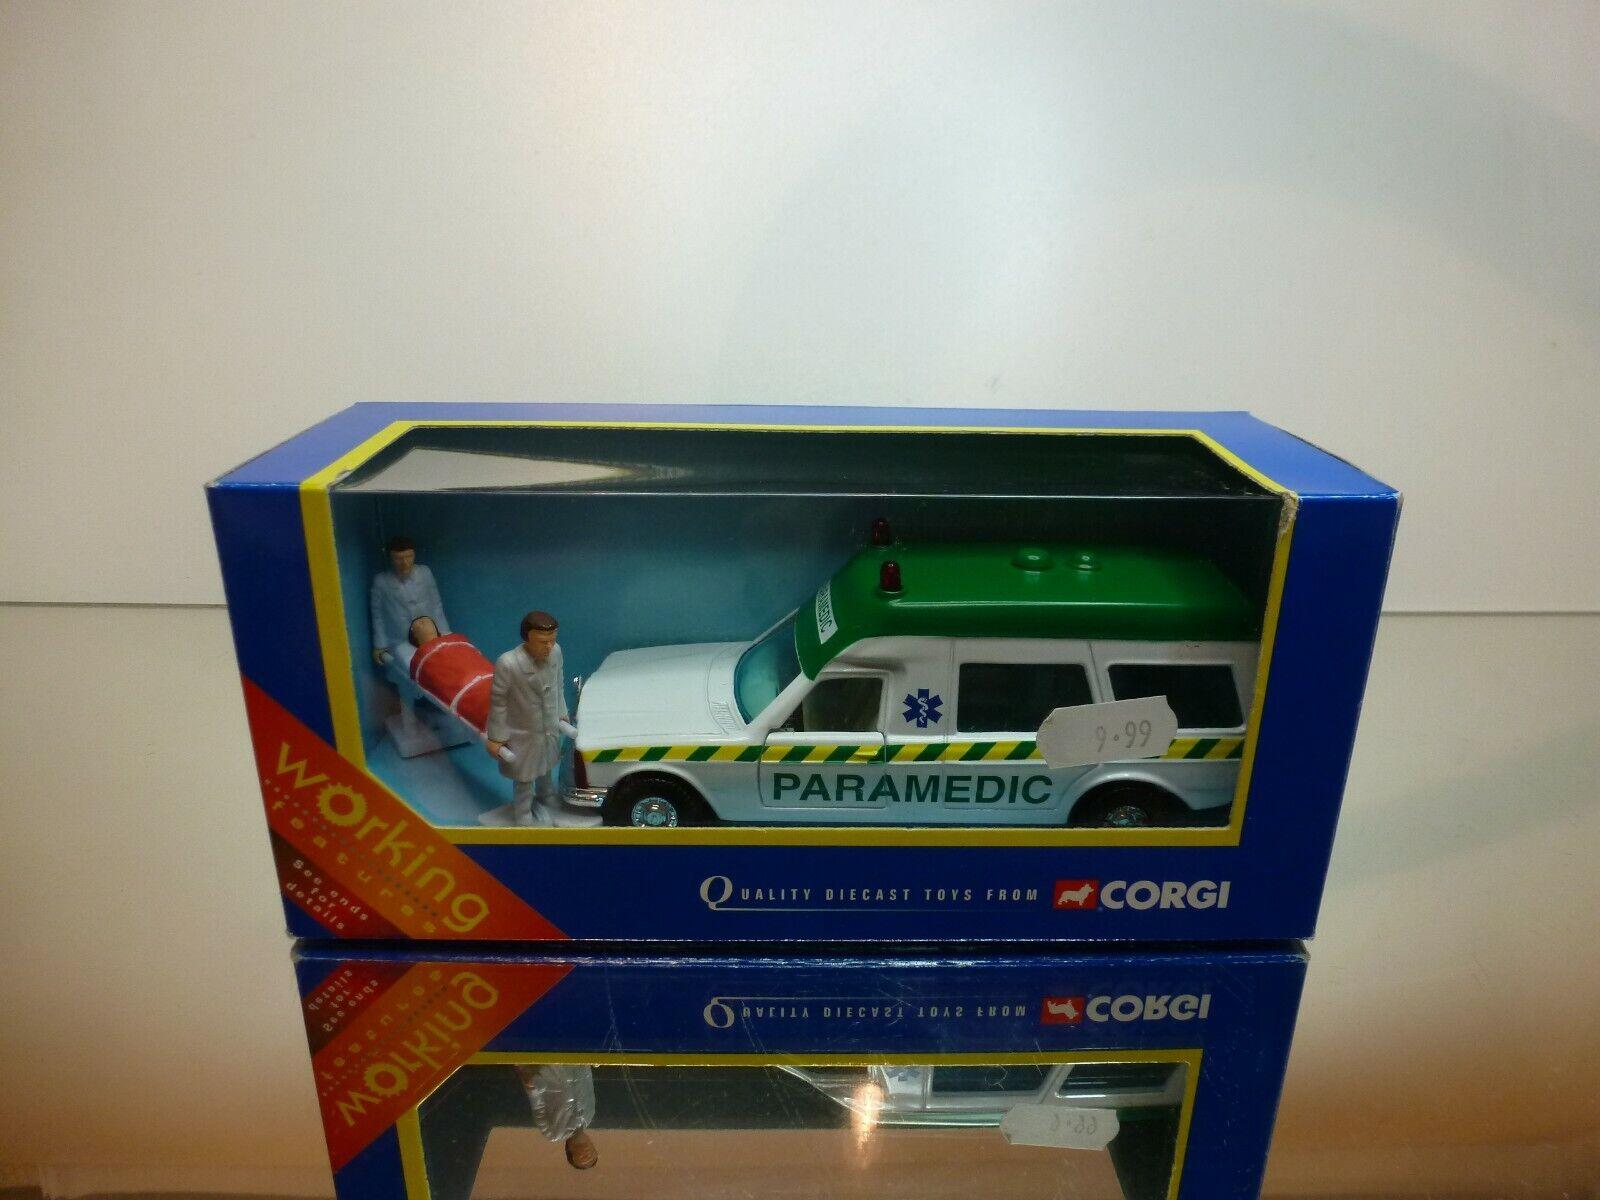 CORGI TOYS 57301 MERCEDES BENZ BONNA AMBULANCE PARAMEDIC - VERY GOOD IN BOX